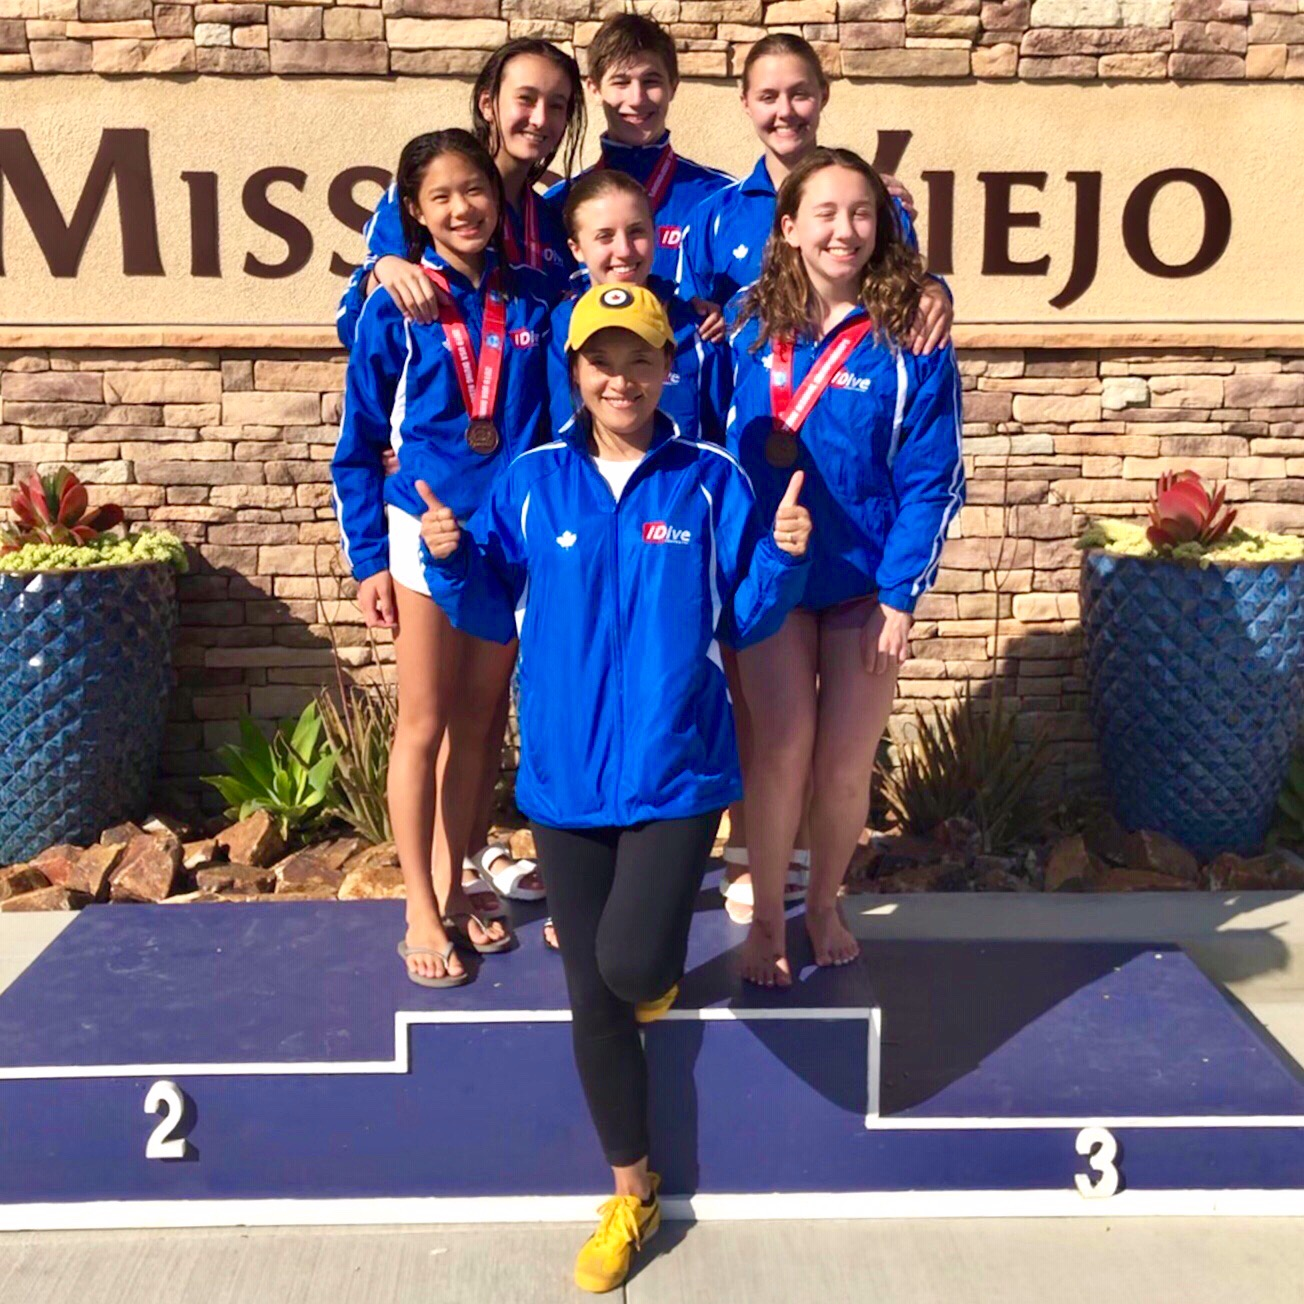 Team at Mission Viejo